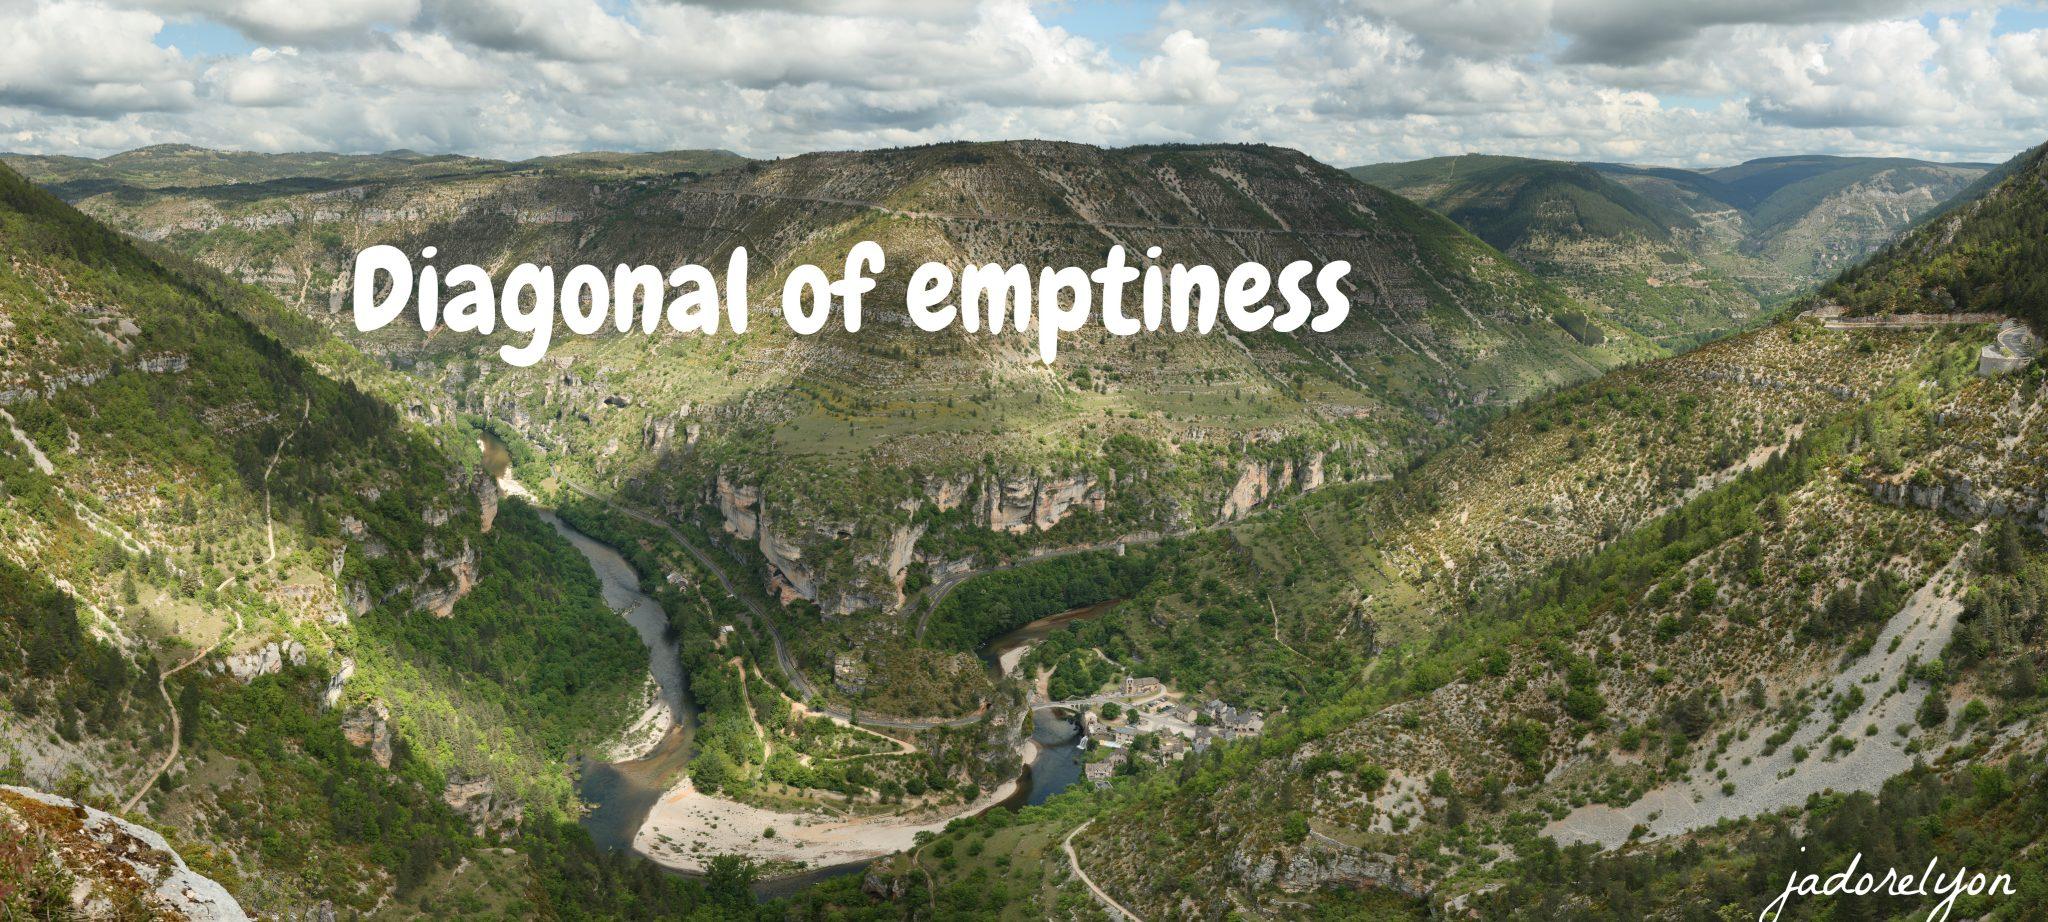 Diagonal Emptiness jadorelyon